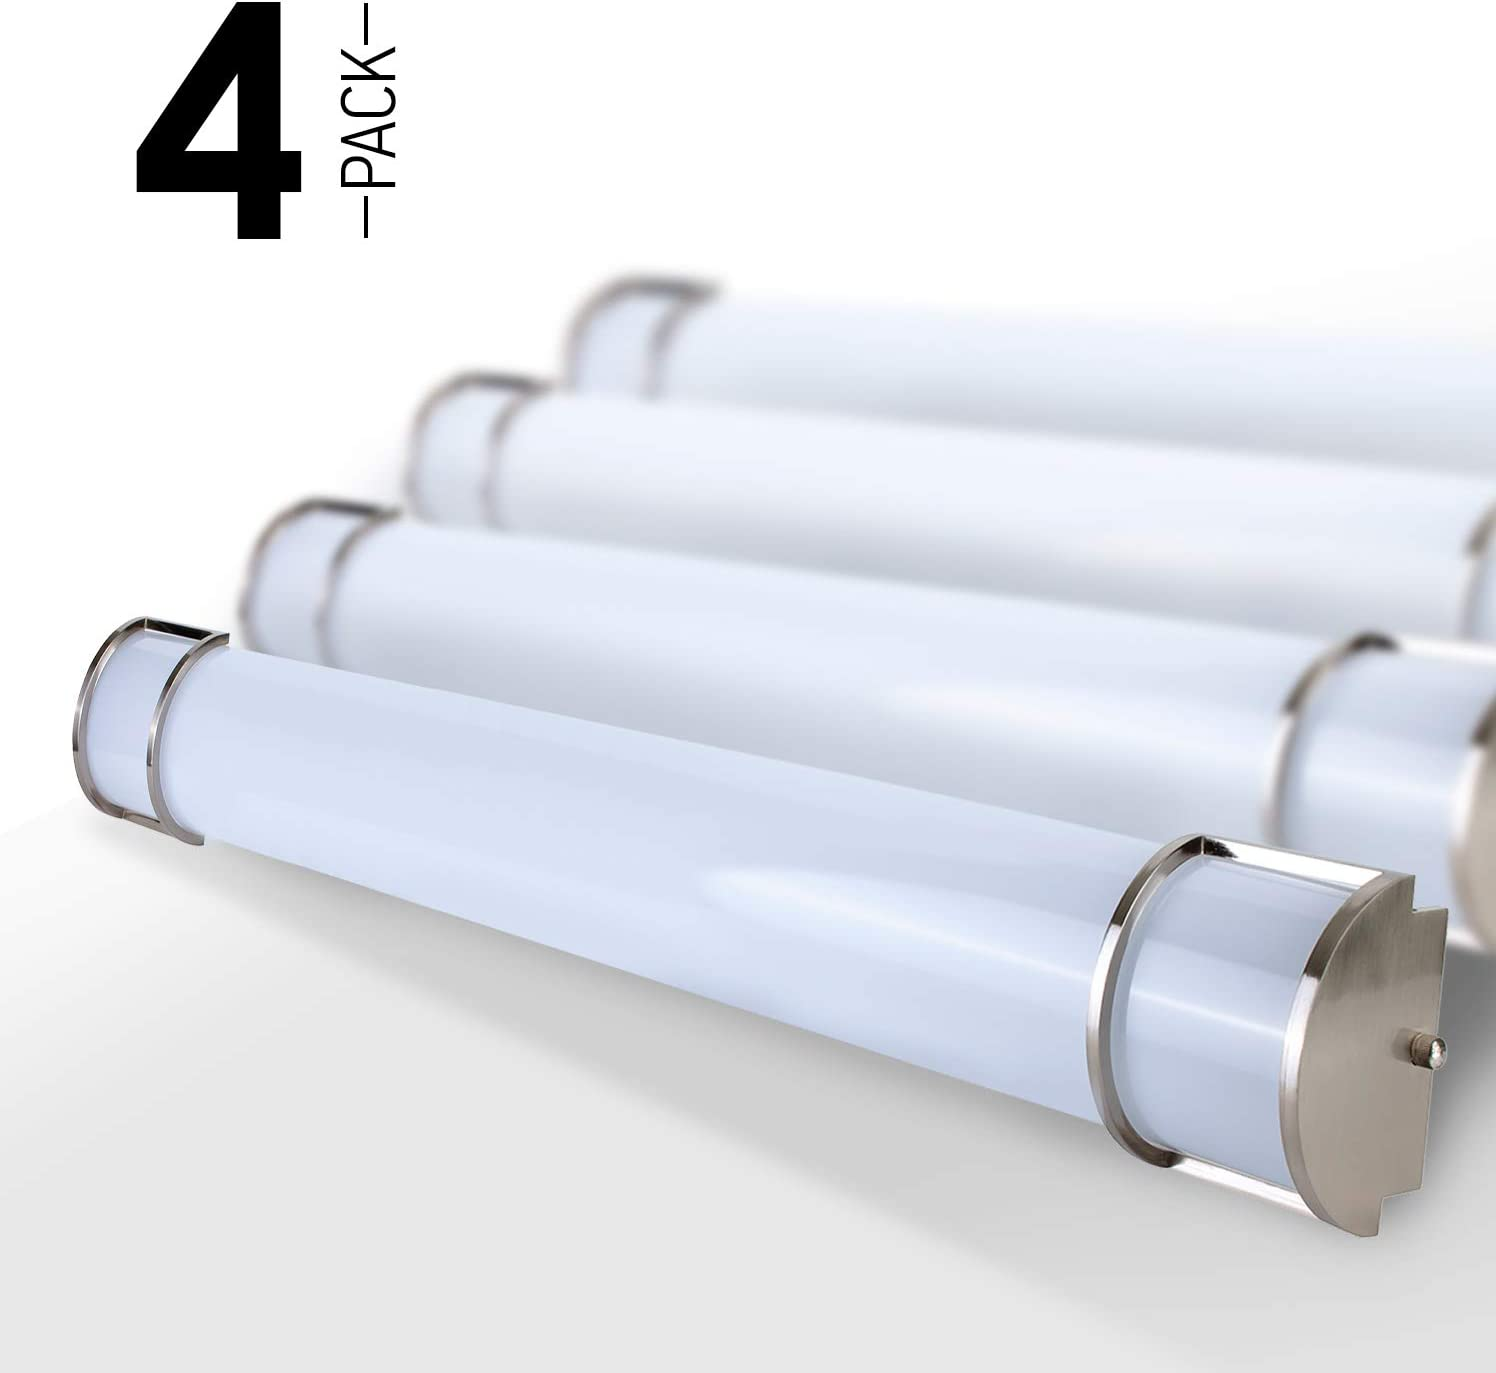 OSTWIN 48 4 Pack Vanity Light Fixture Brushed Nickel, Led Vanity Lighting 35W 5000K Daylight, Large Size, Vertical or Horizontal Tube, Brushed Nickel Finish, ETL Energy Star Listed